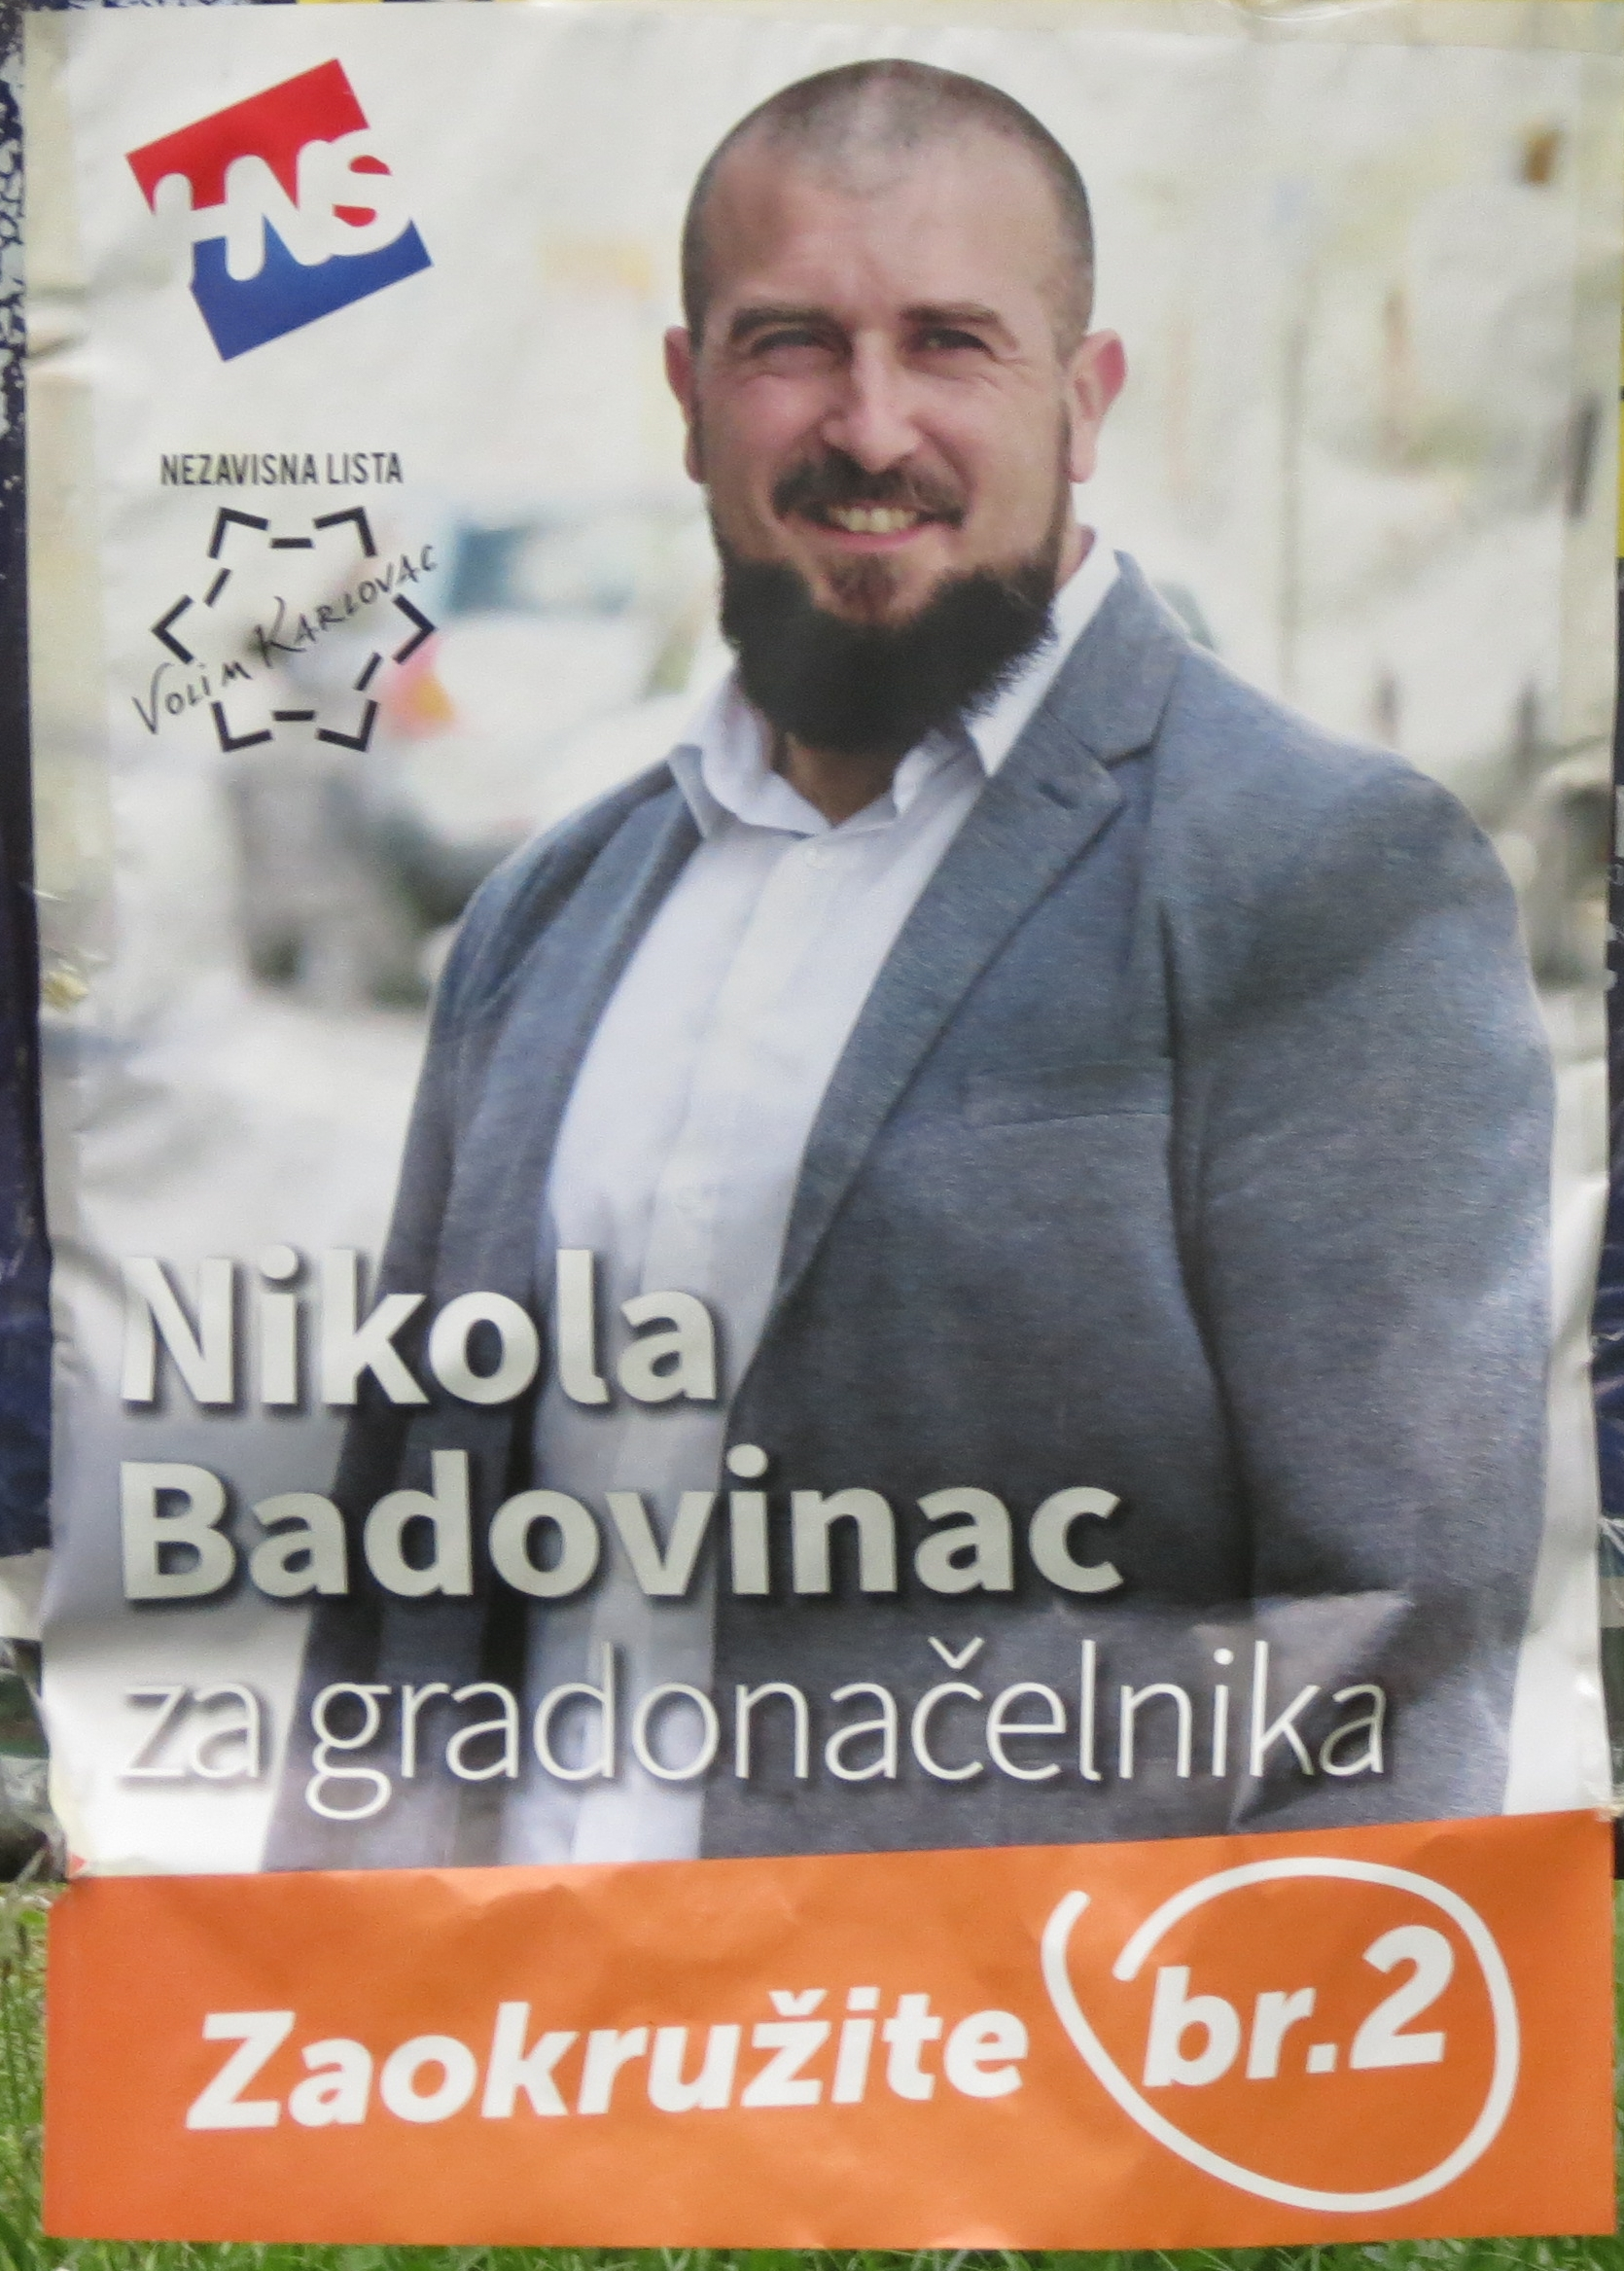 Cidade de Karlovac – Hrvatska narodna stranka (HNS – Partido Popular Croata)